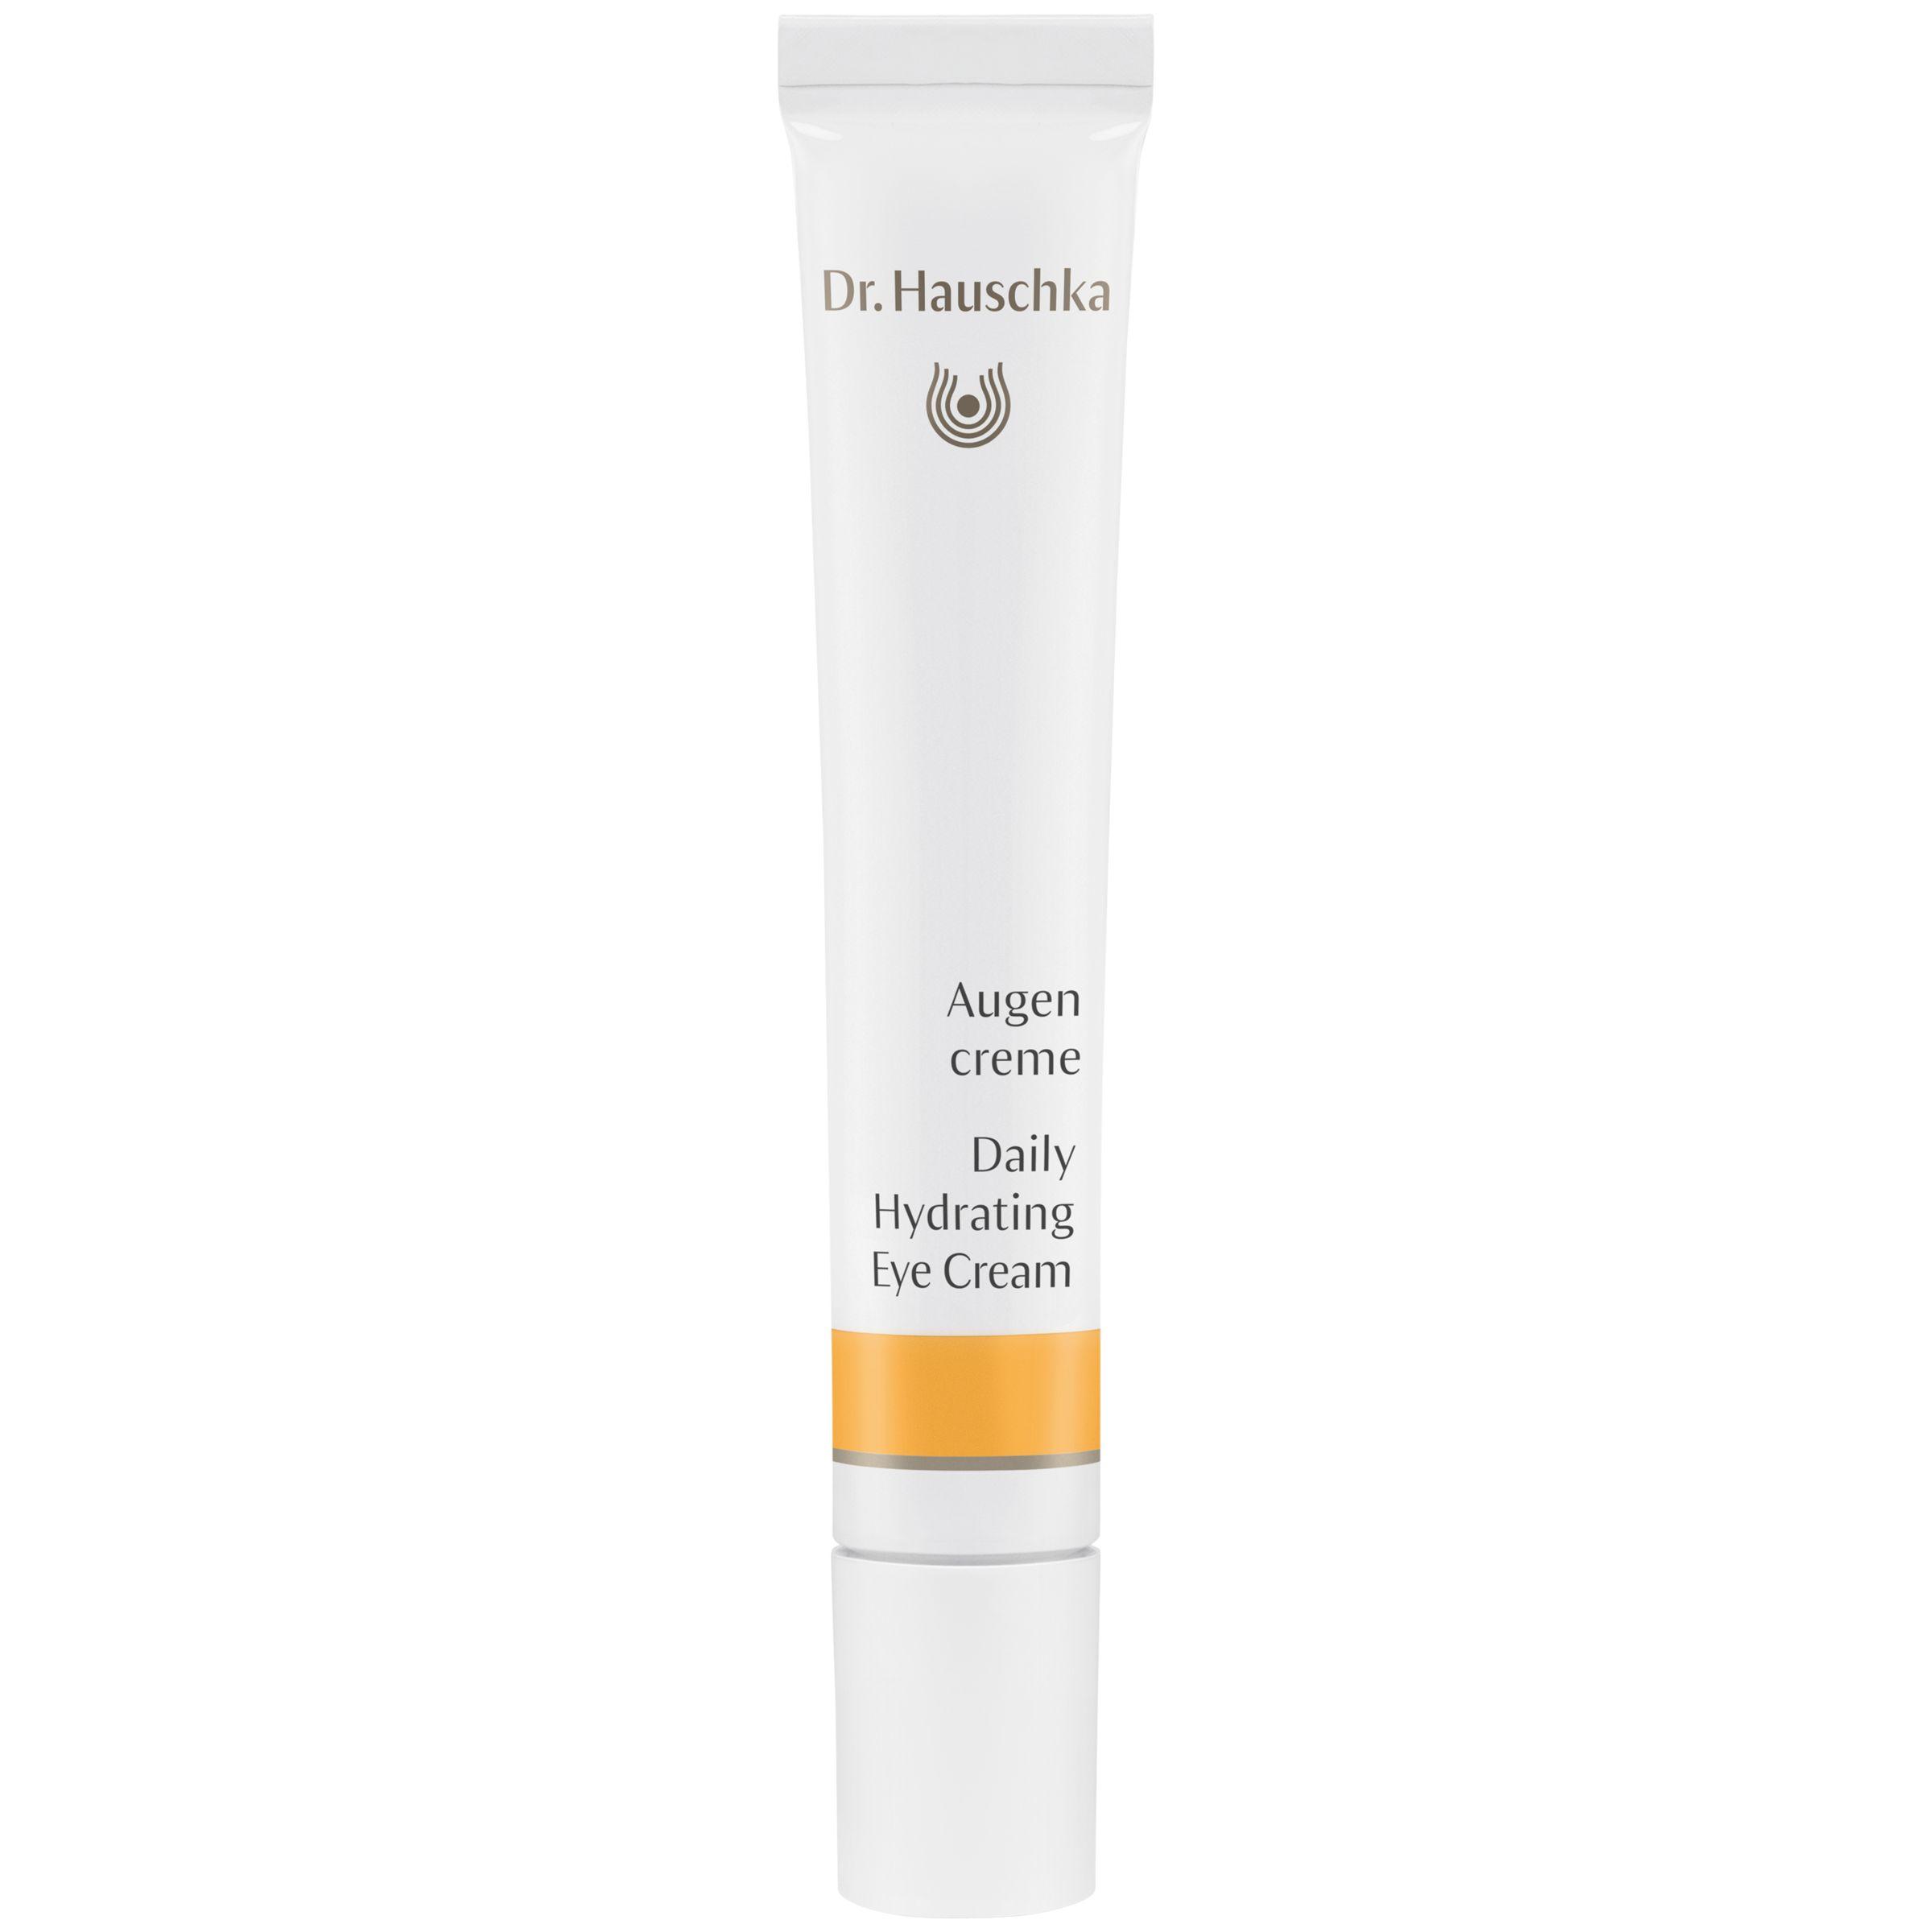 Dr Hauschka Dr Hauschka Daily Hydrating Eye Cream, 12.5ml